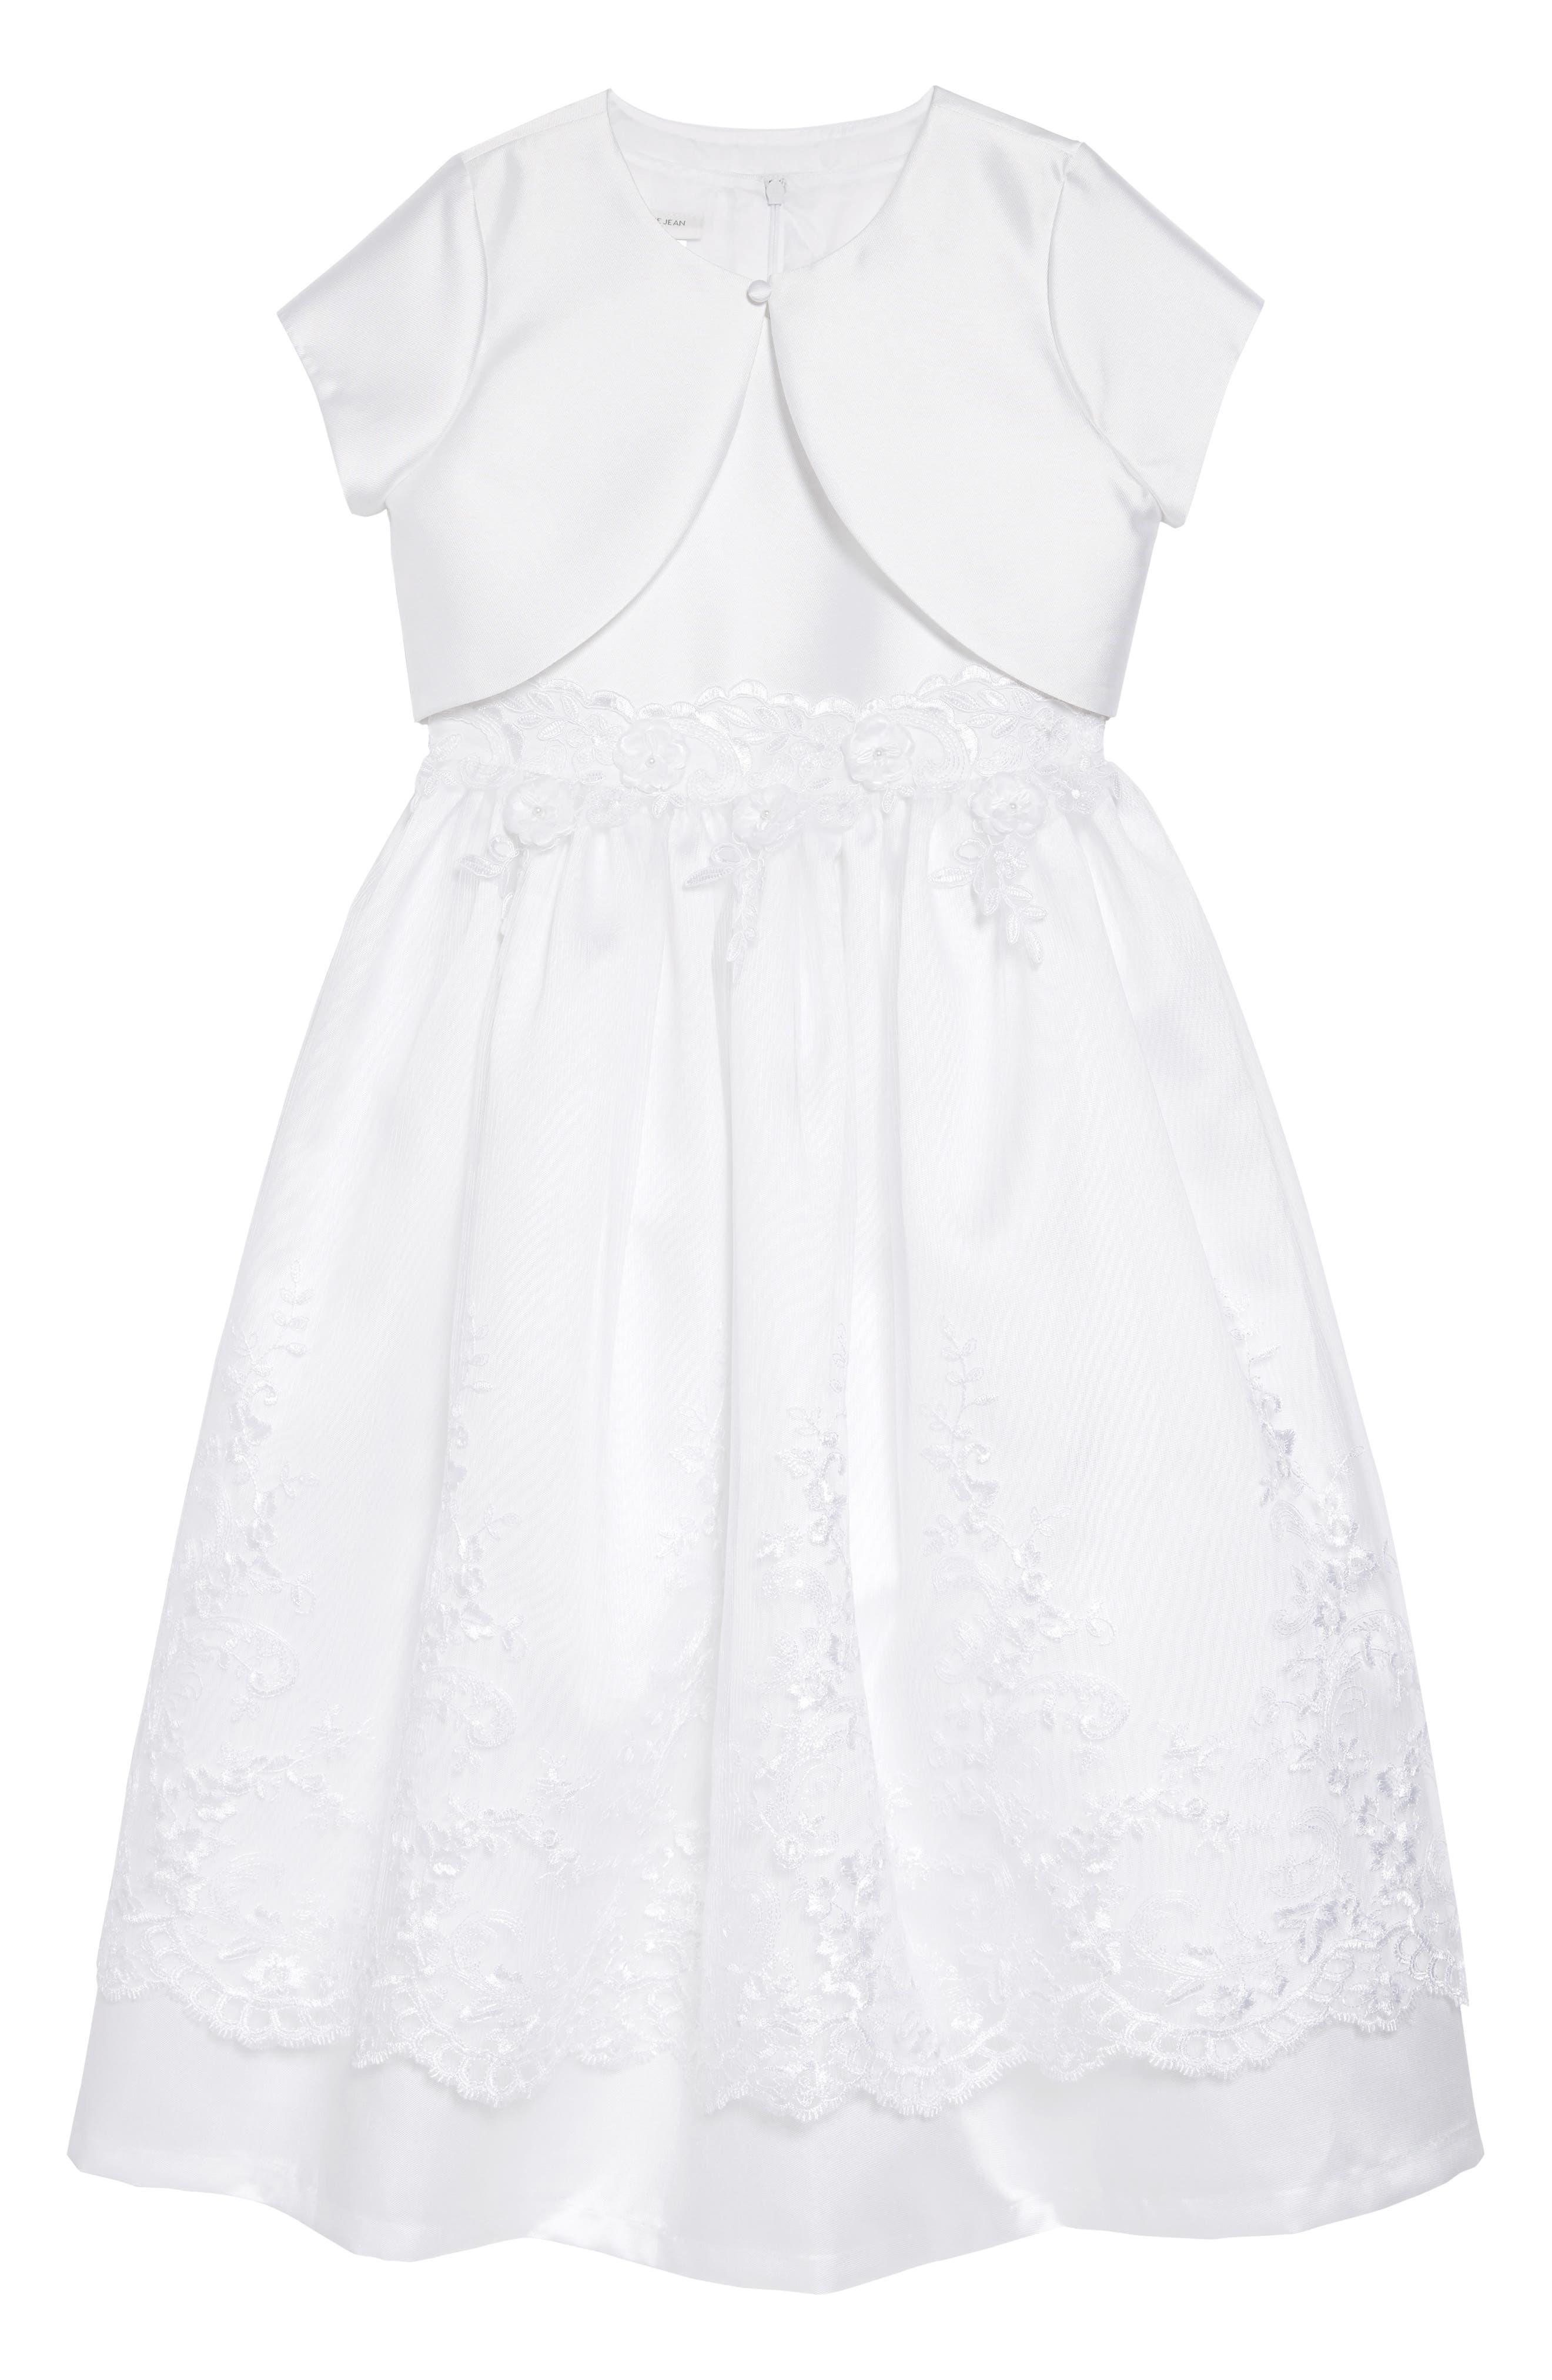 IRIS & IVY, Sweetheart Fit & Flare Mikado Dress & Jacket Set, Main thumbnail 1, color, WHITE